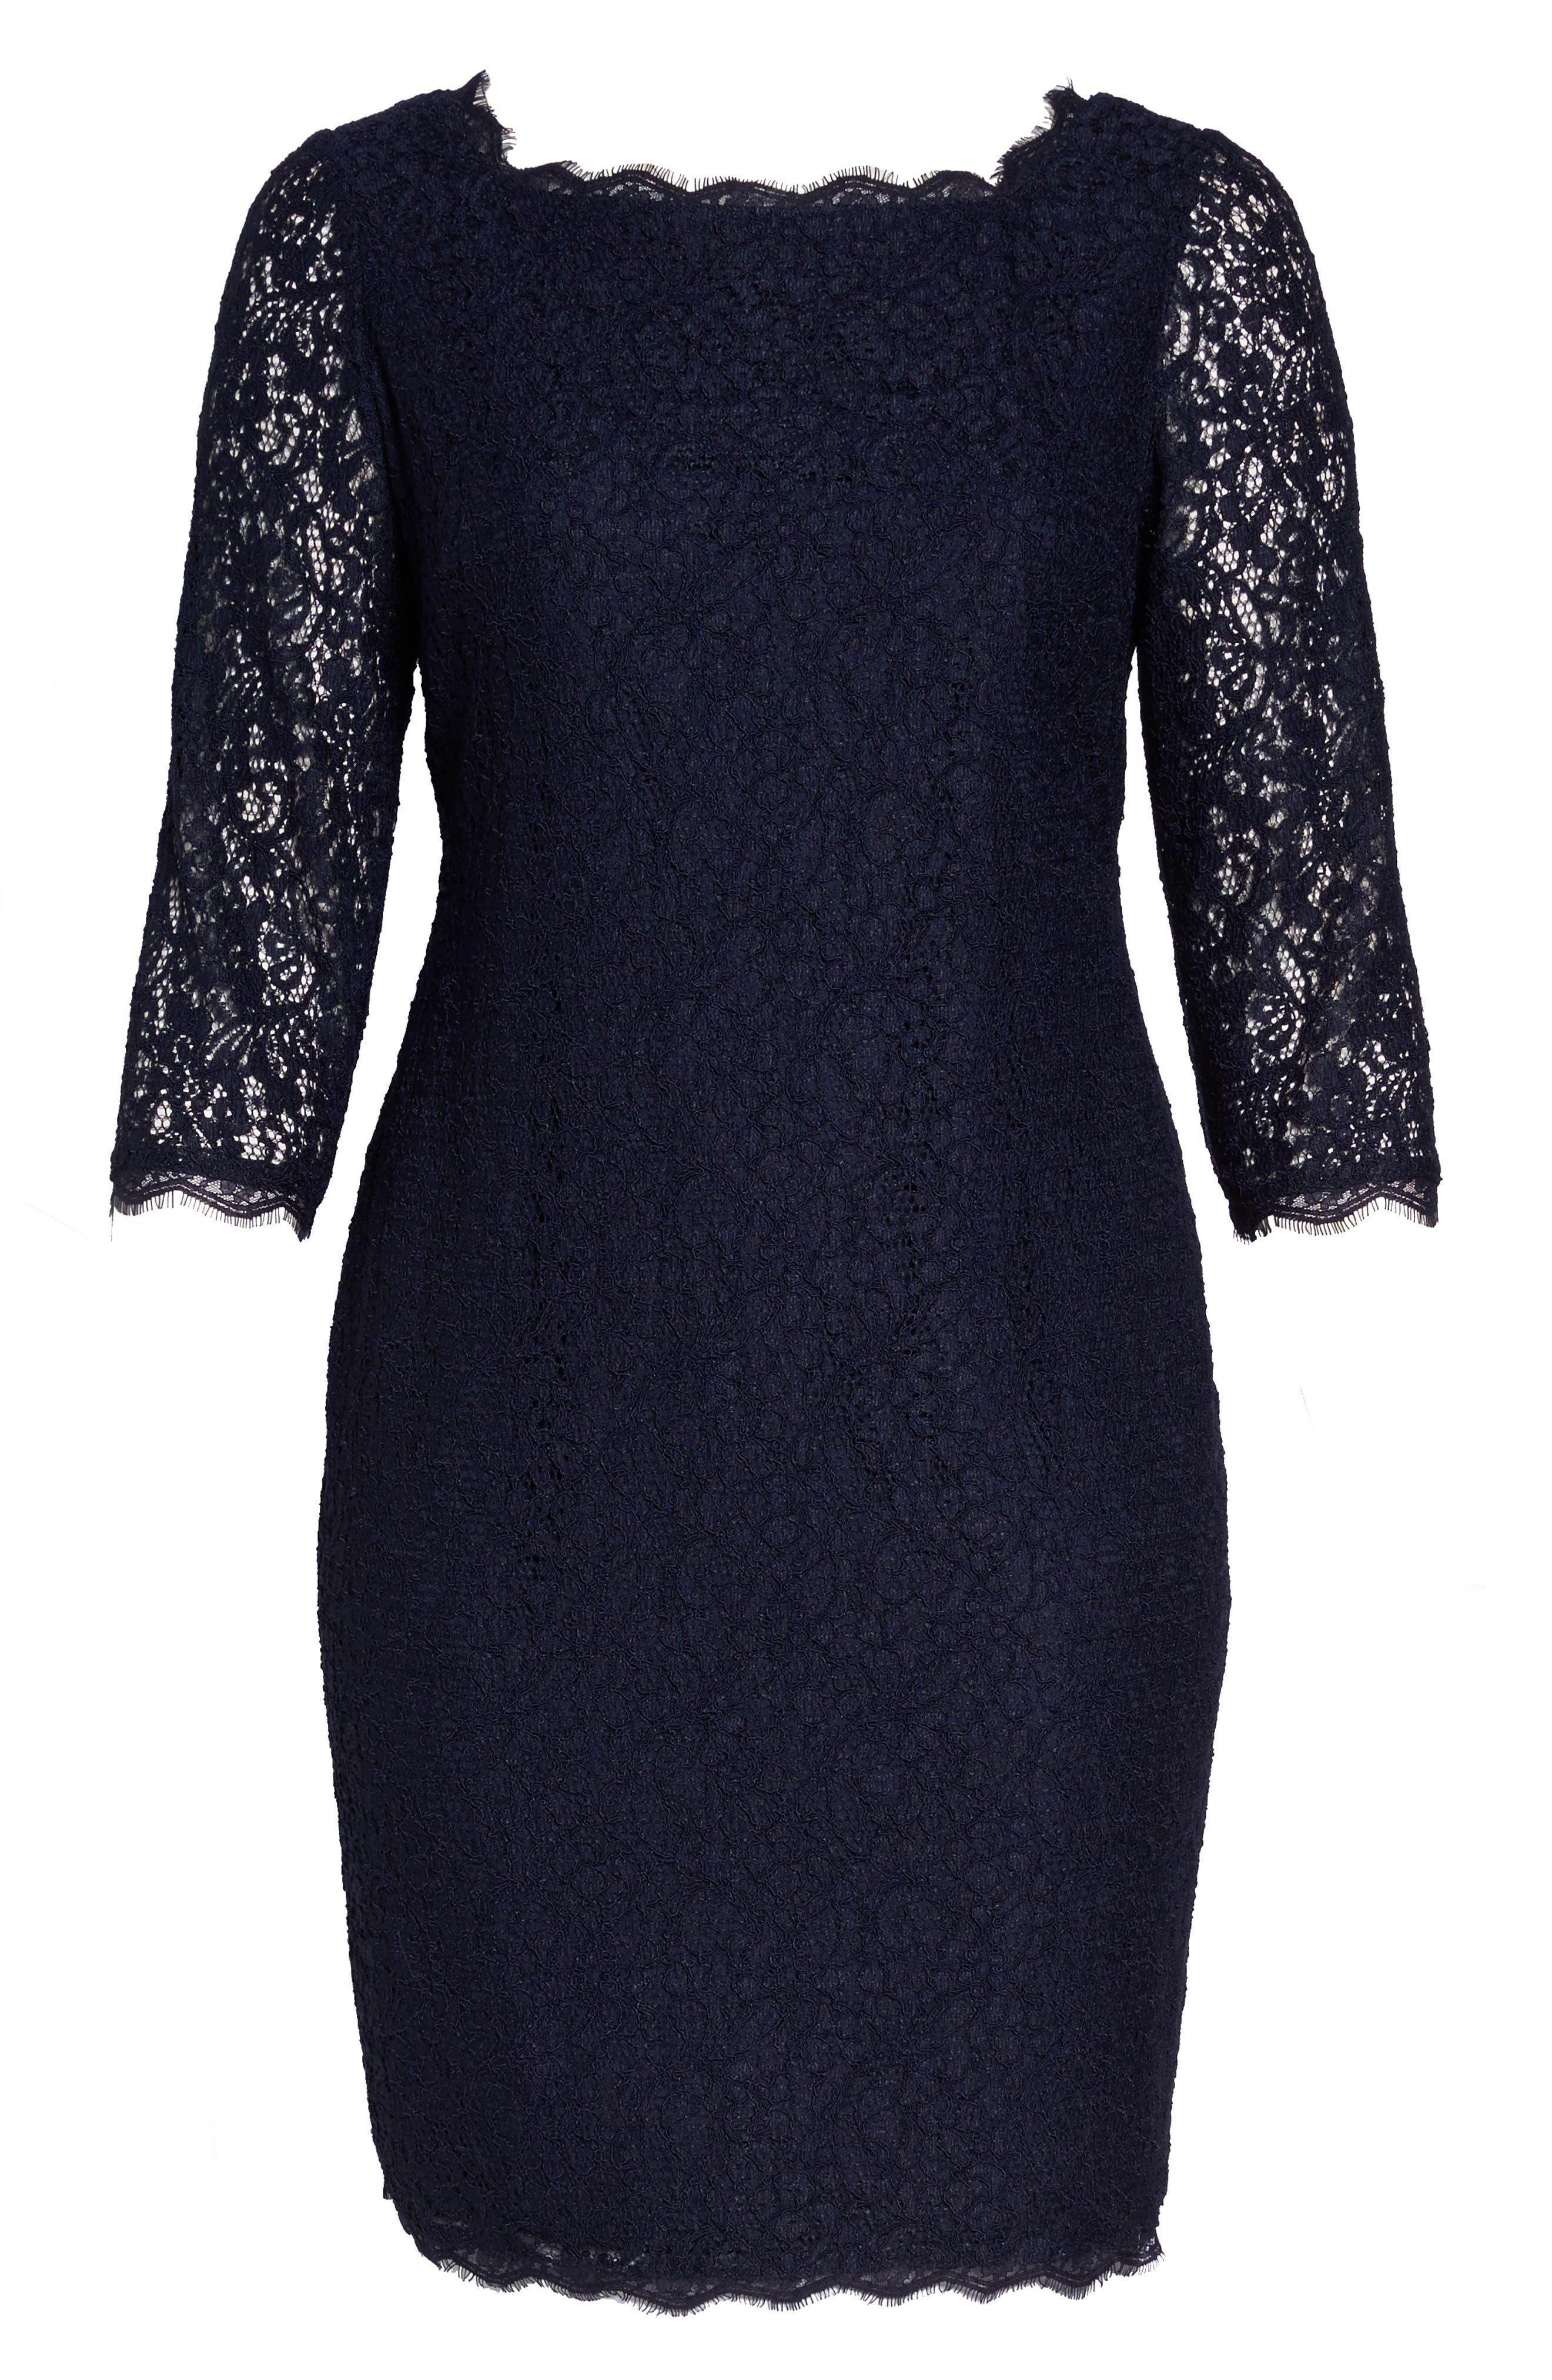 Lace Overlay Sheath Dress,                             Alternate thumbnail 6, color,                             Navy